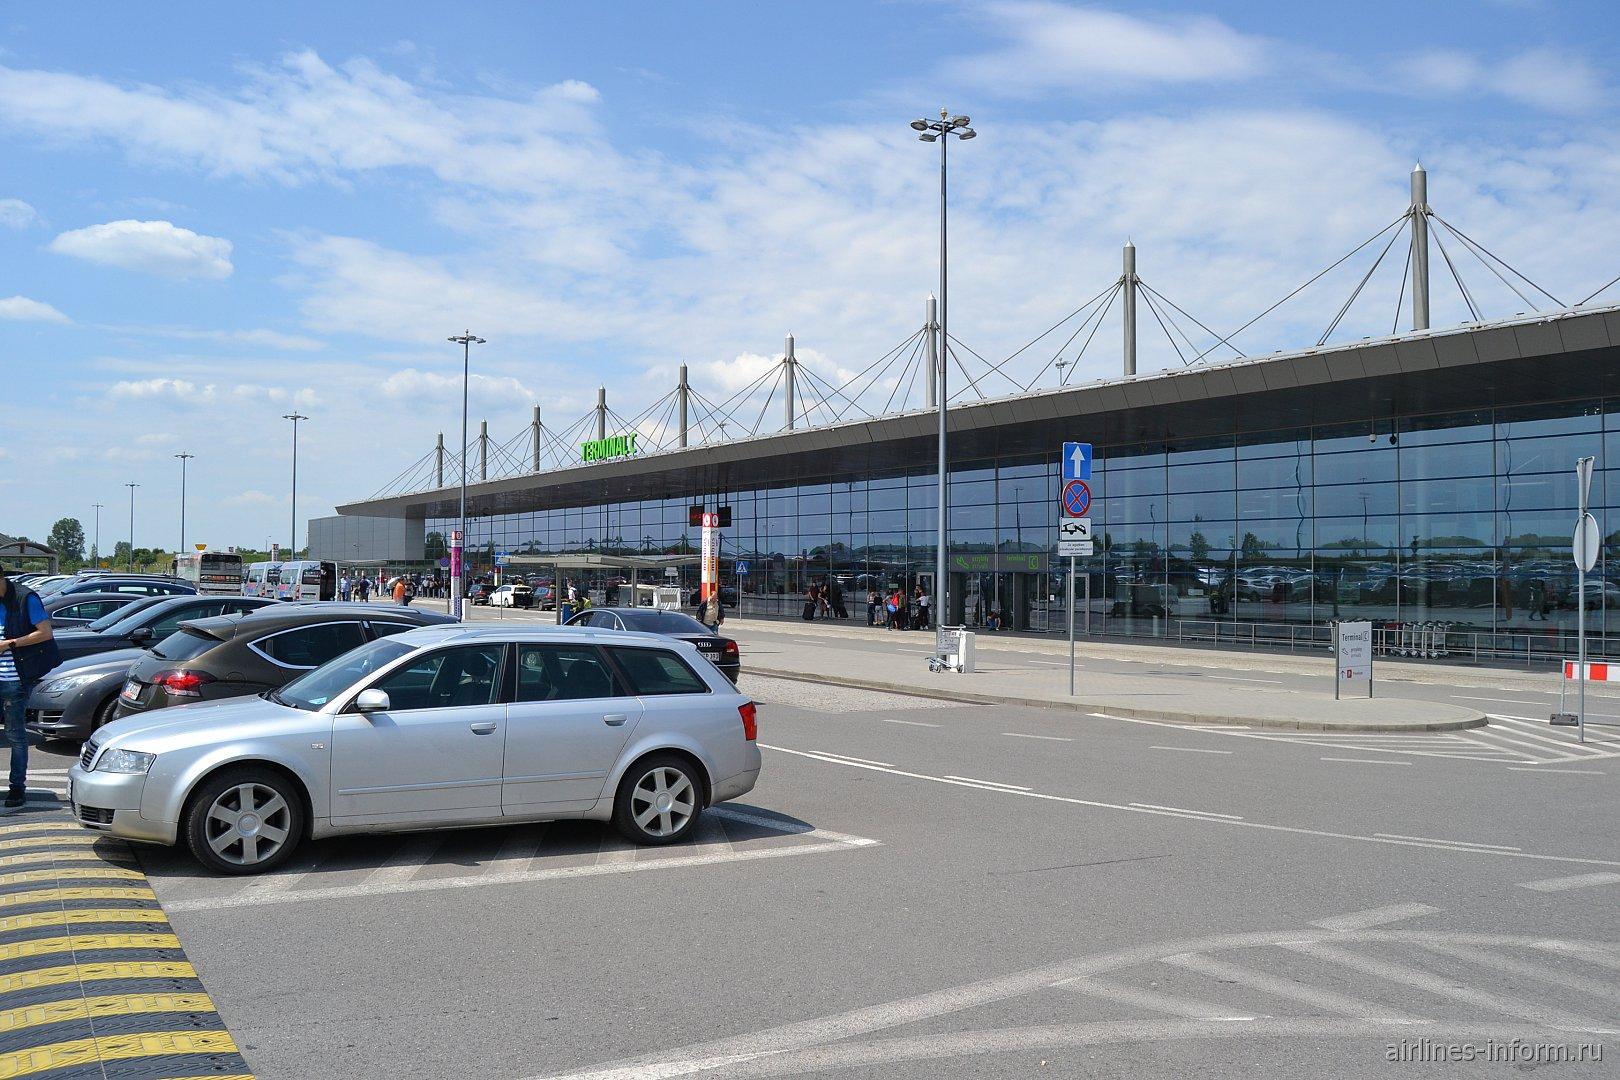 Пассажирский терминал C аэропорта Катовице